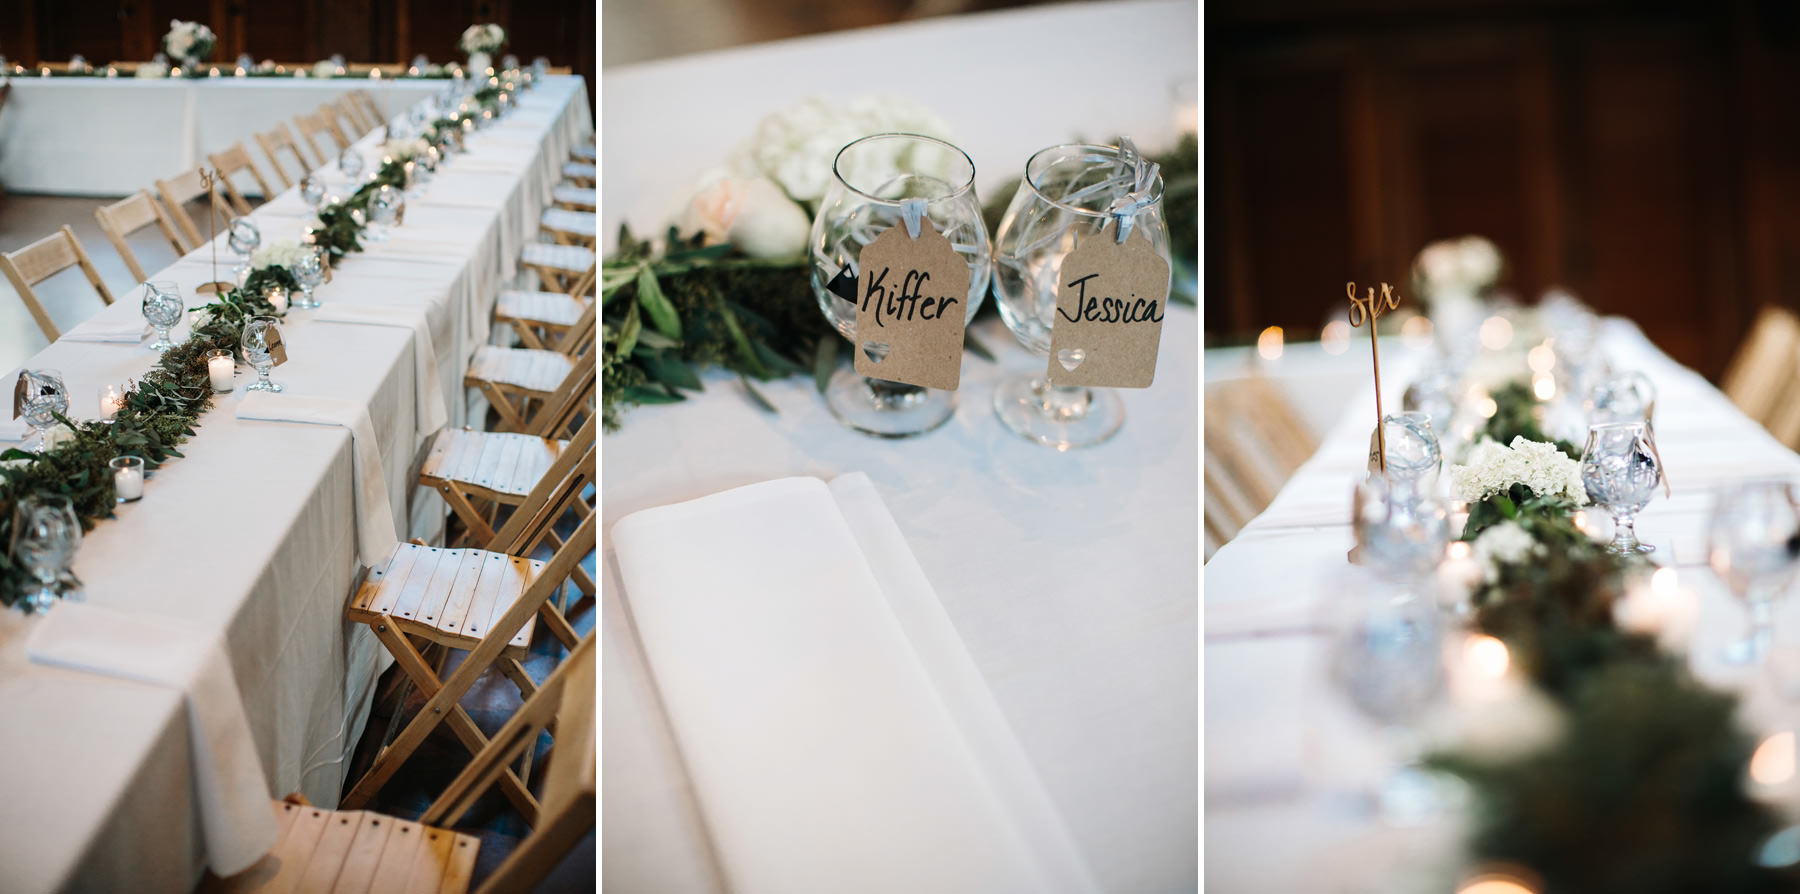 Vail Colorado Wedding Deck_ Kindling Wedding Photography64.JPG